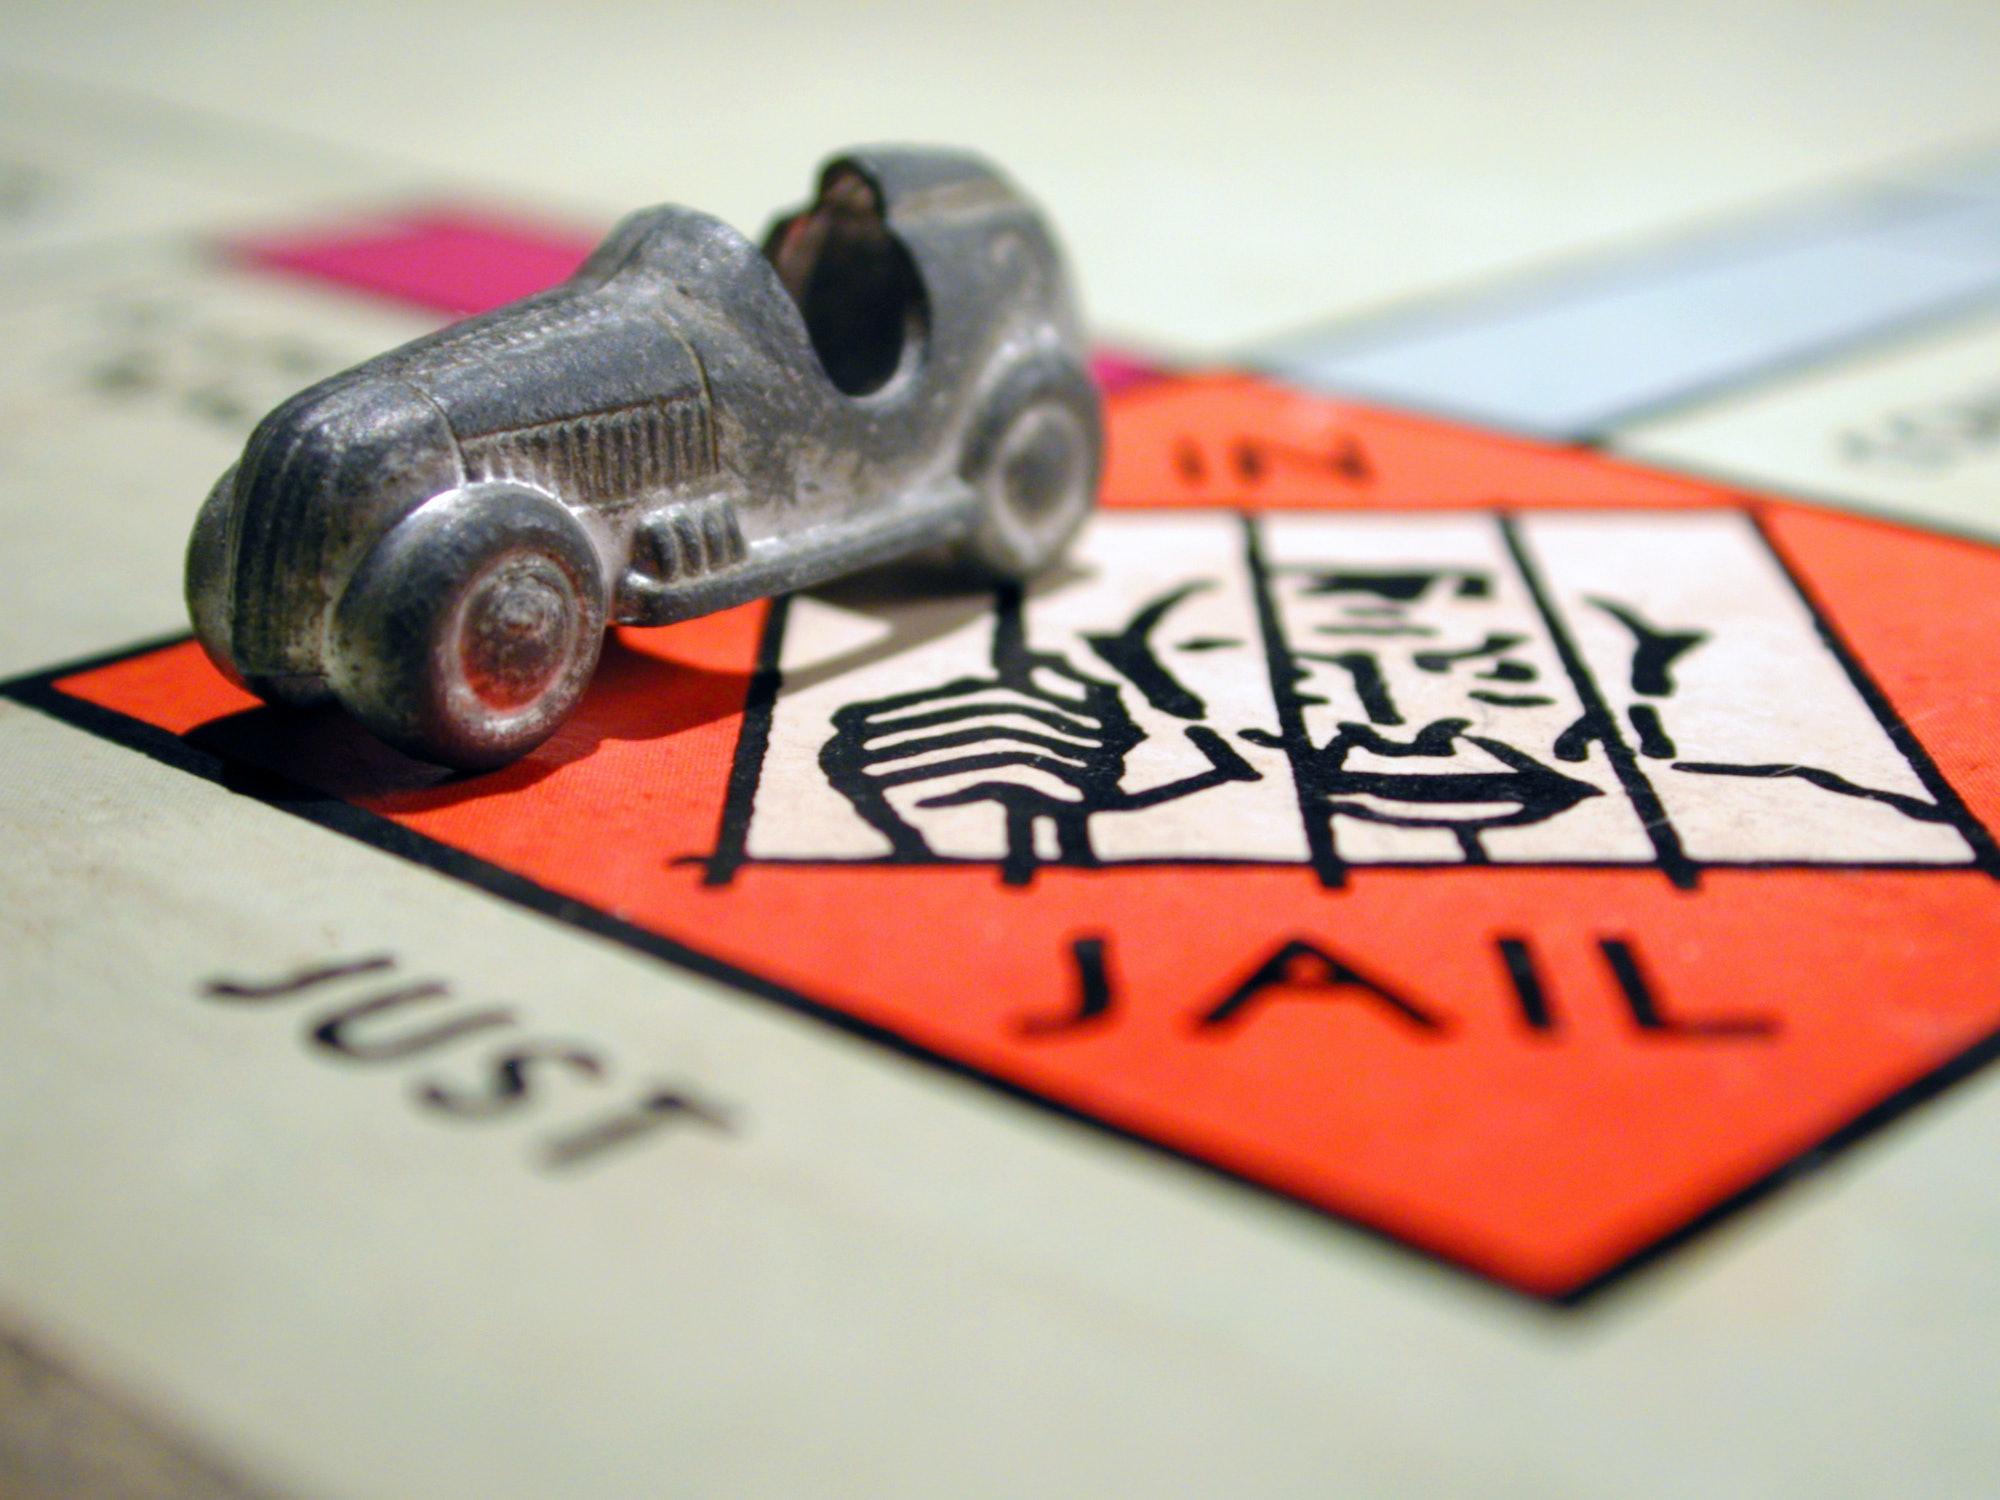 monopoly jail just visiting board game car